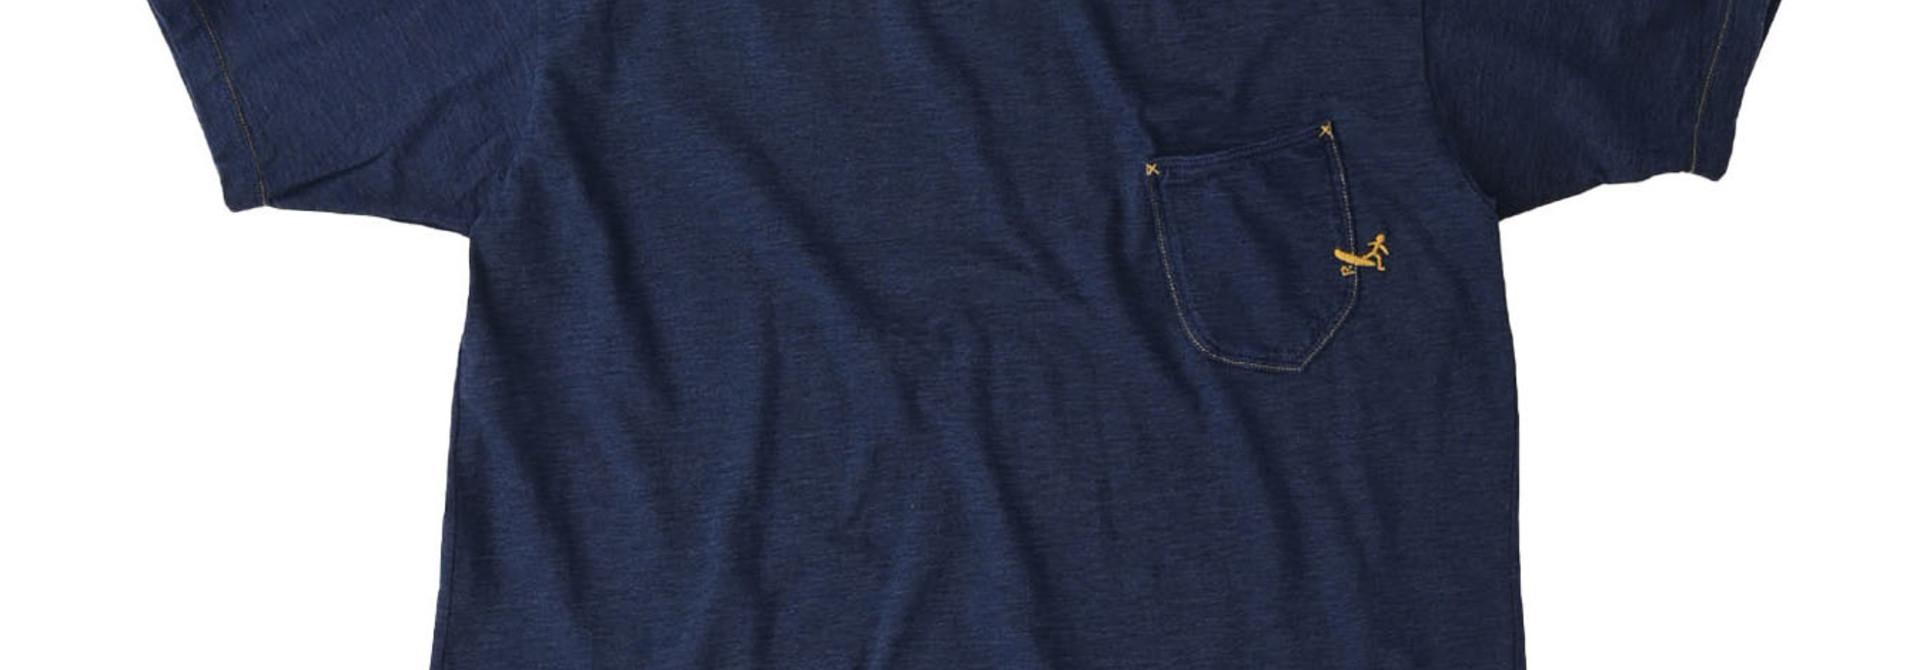 Indigo Hayama-kun Embroidered 908 Ocean T-shirt (0621)